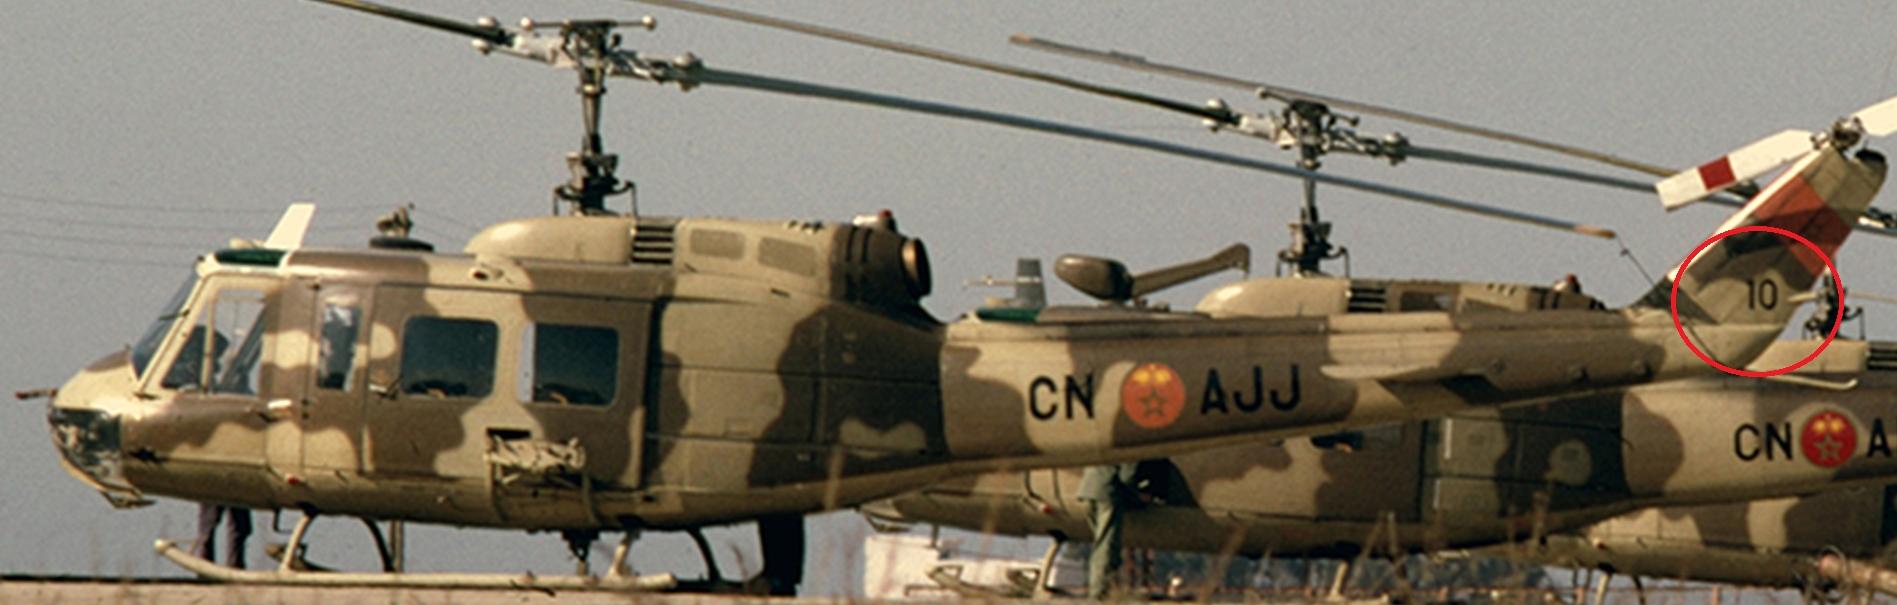 FRA: Photos d'hélicoptères - Page 17 Clipb286